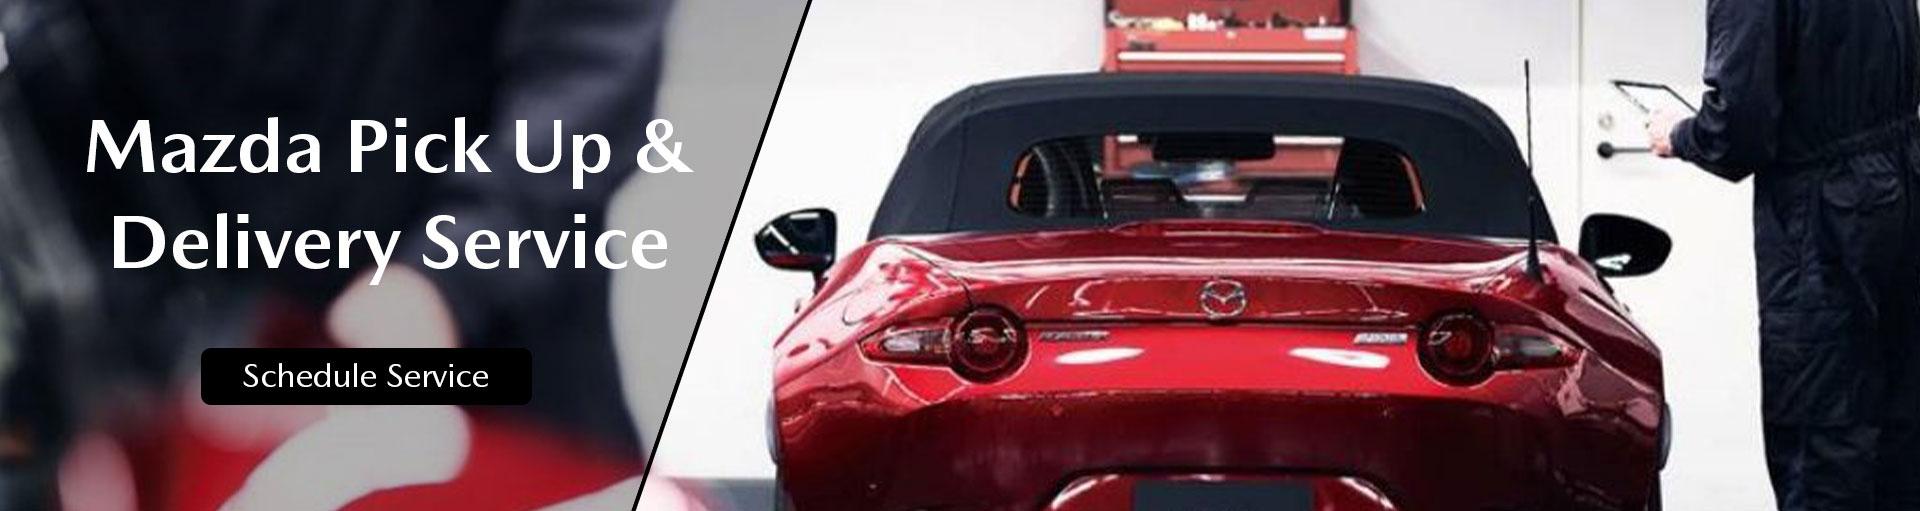 Russ Darrow Mazda Pick Up & Delivery Service